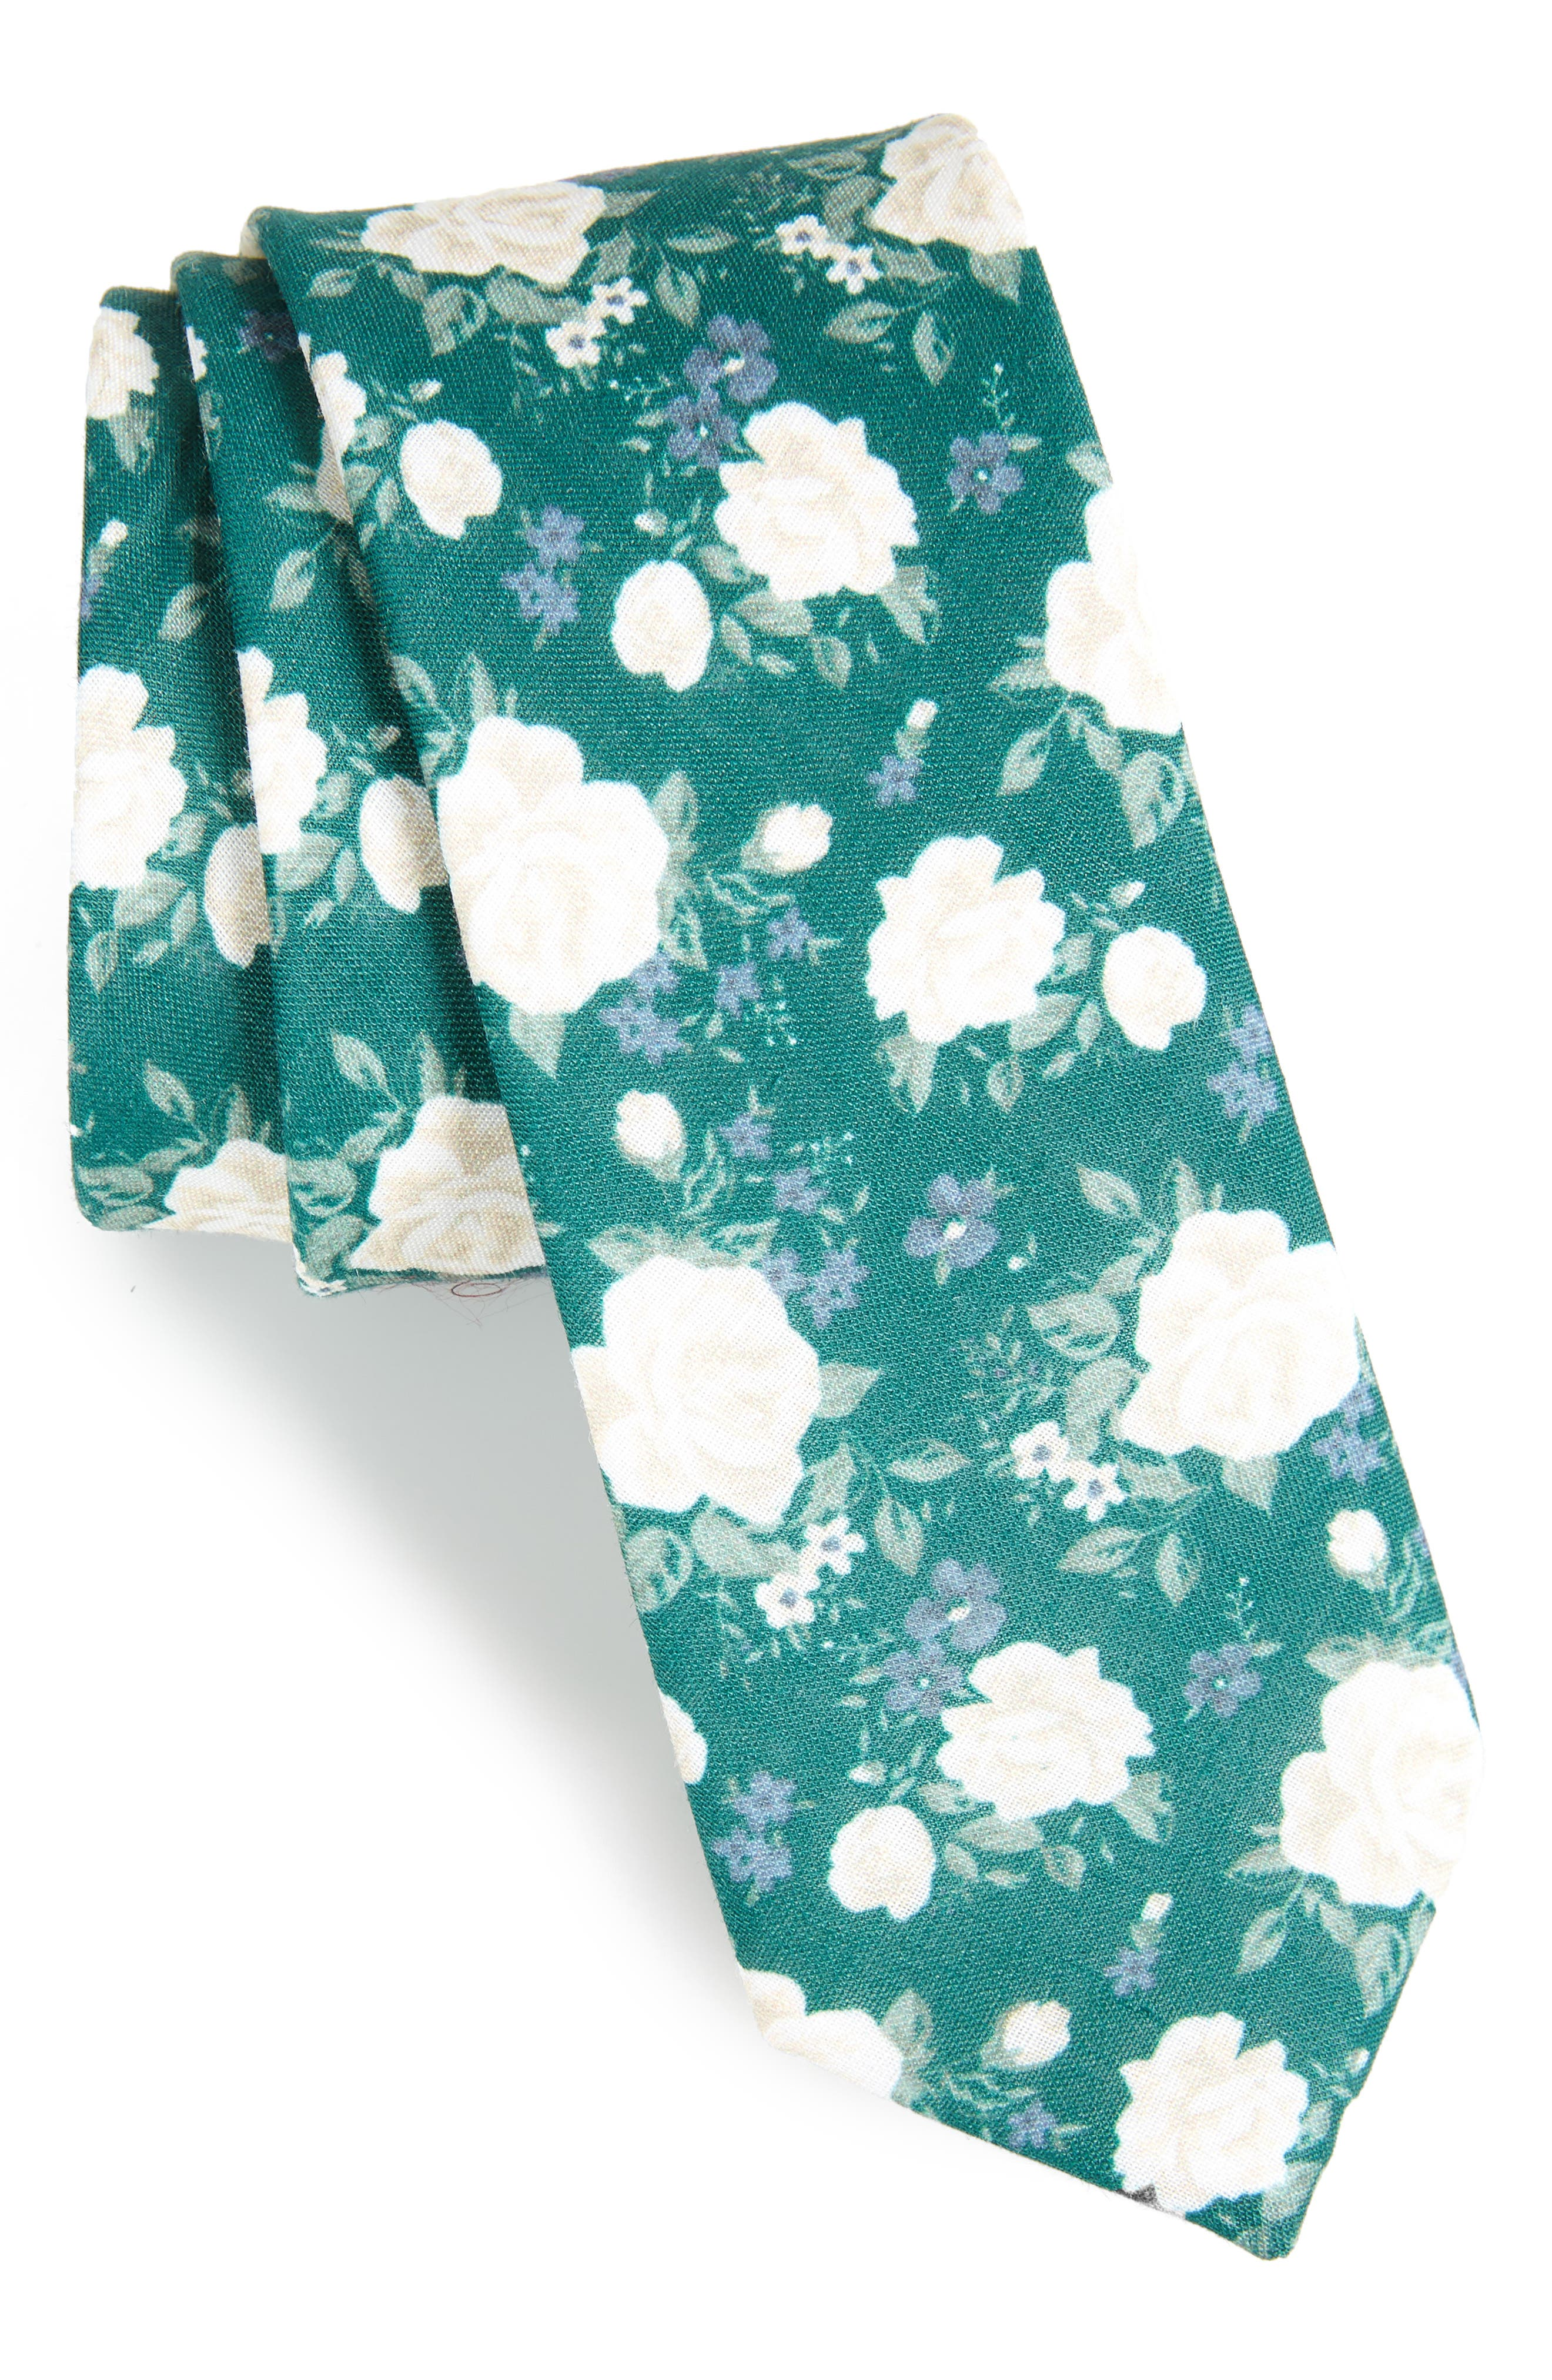 Hodgkiss Flowers Linen Tie,                             Main thumbnail 1, color,                             HUNTER GREEN